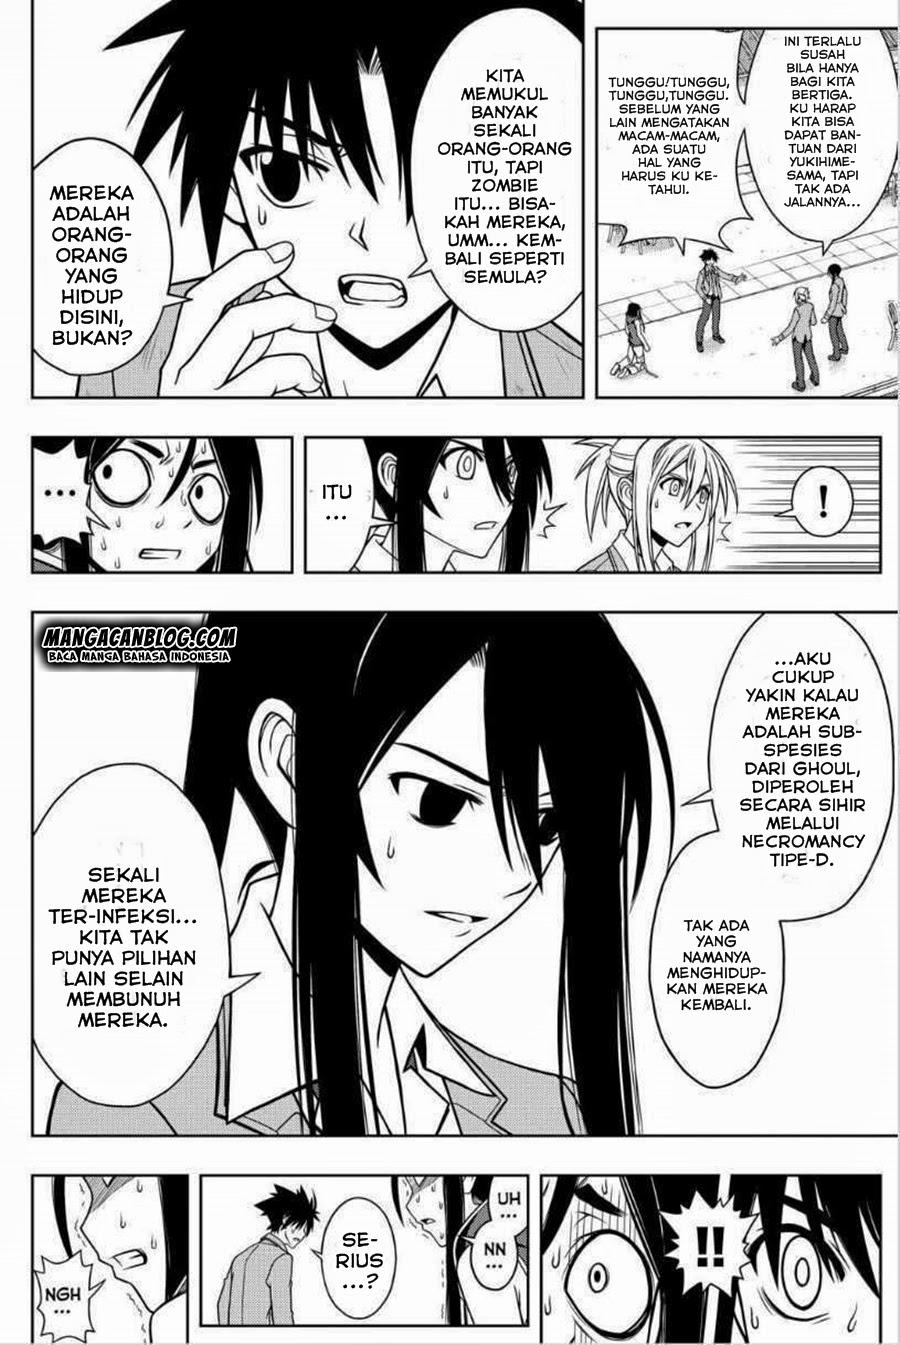 Komik uq holder 053 - buat latihan 54 Indonesia uq holder 053 - buat latihan Terbaru 8|Baca Manga Komik Indonesia